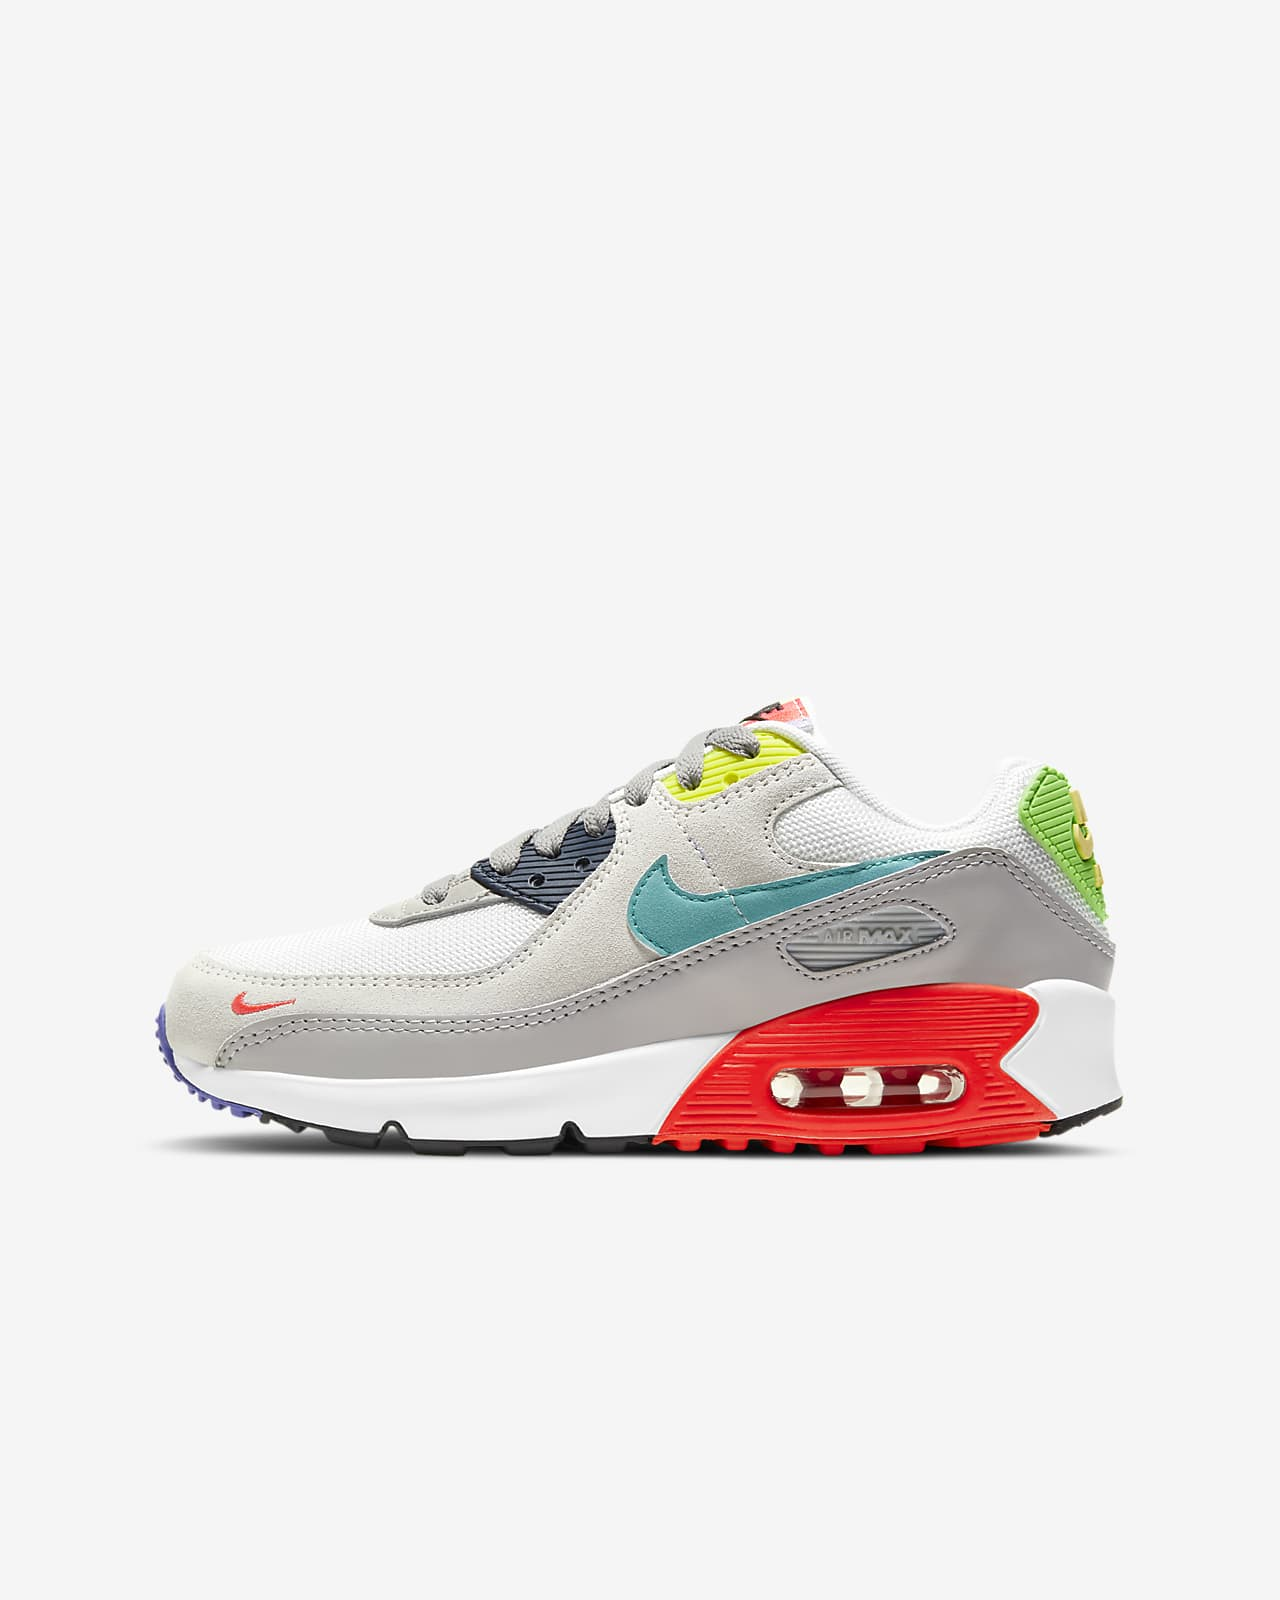 Nike Air Max 90 EOI Big Kids' Shoe